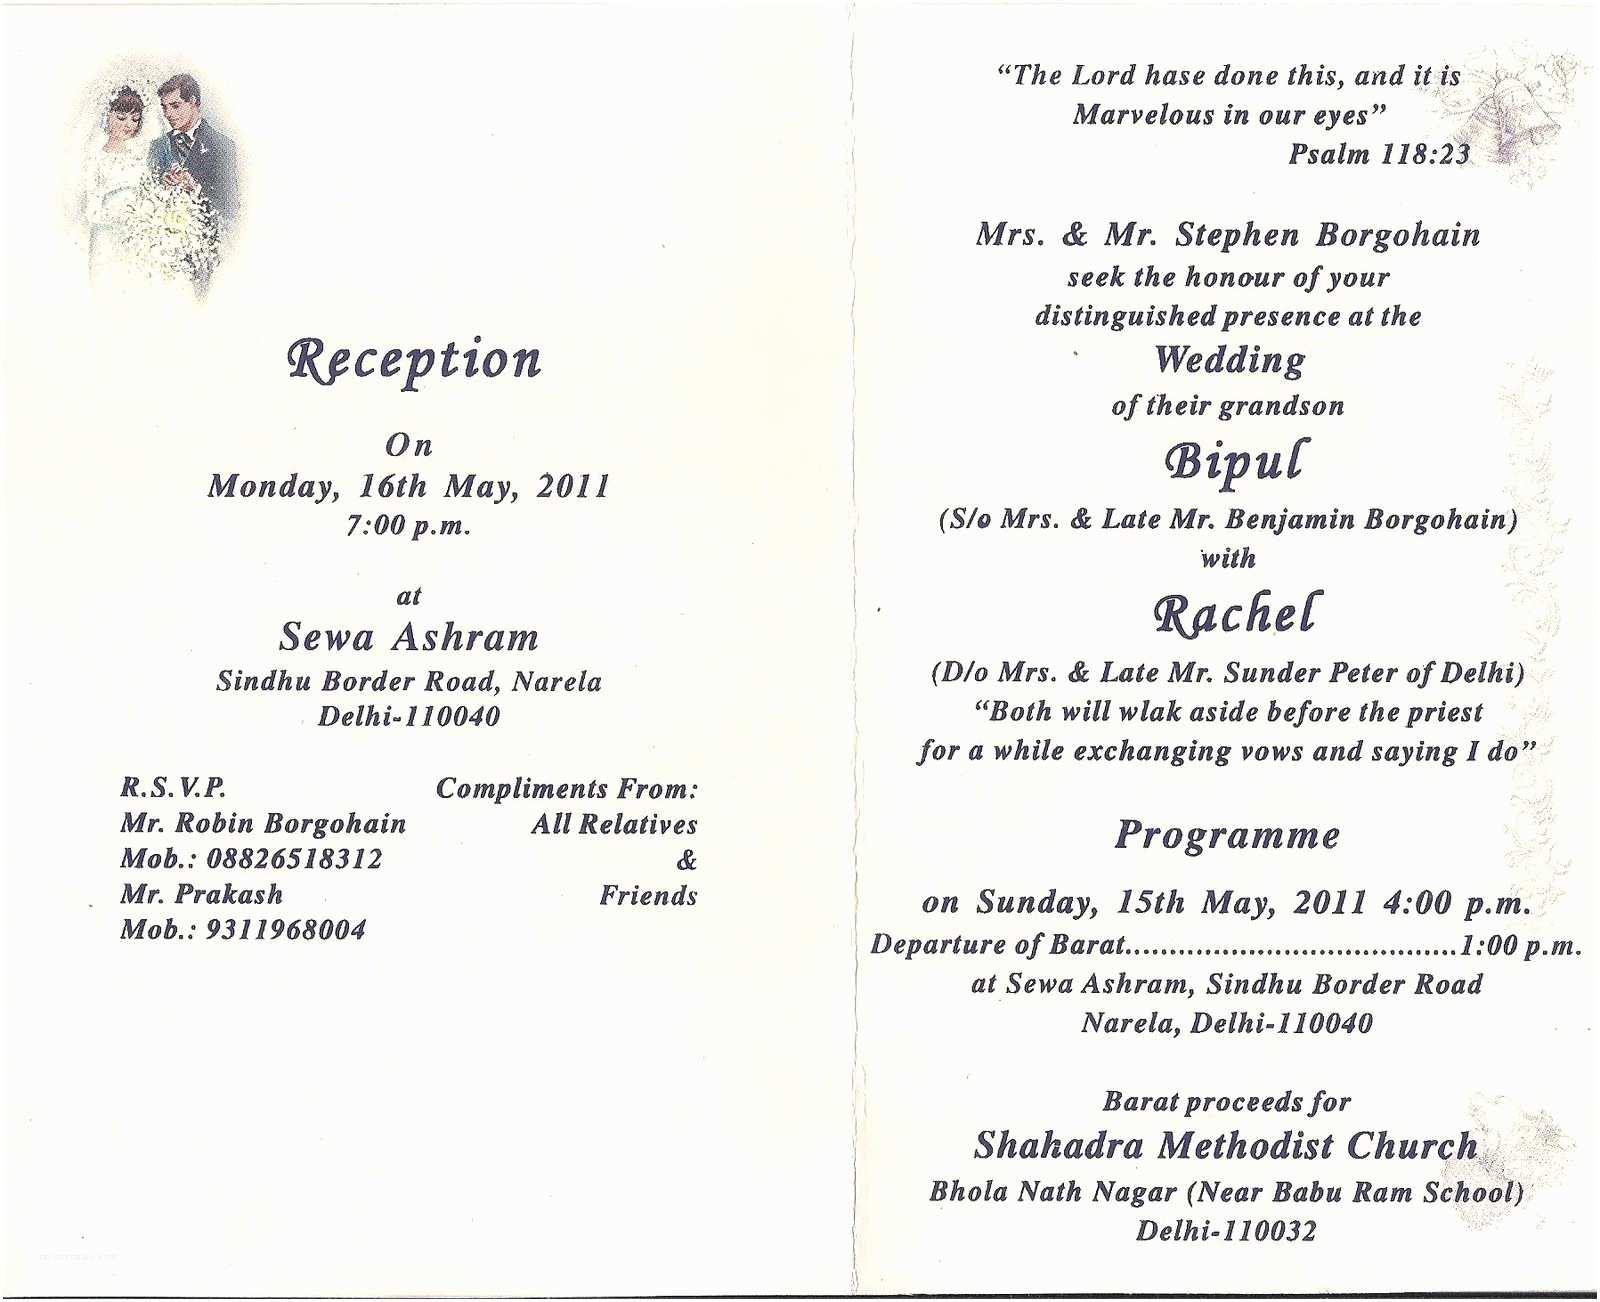 Jewish Wedding Invitation Wording Samples Sample Jewish Wedding Invitation Text Valid Bichelle S